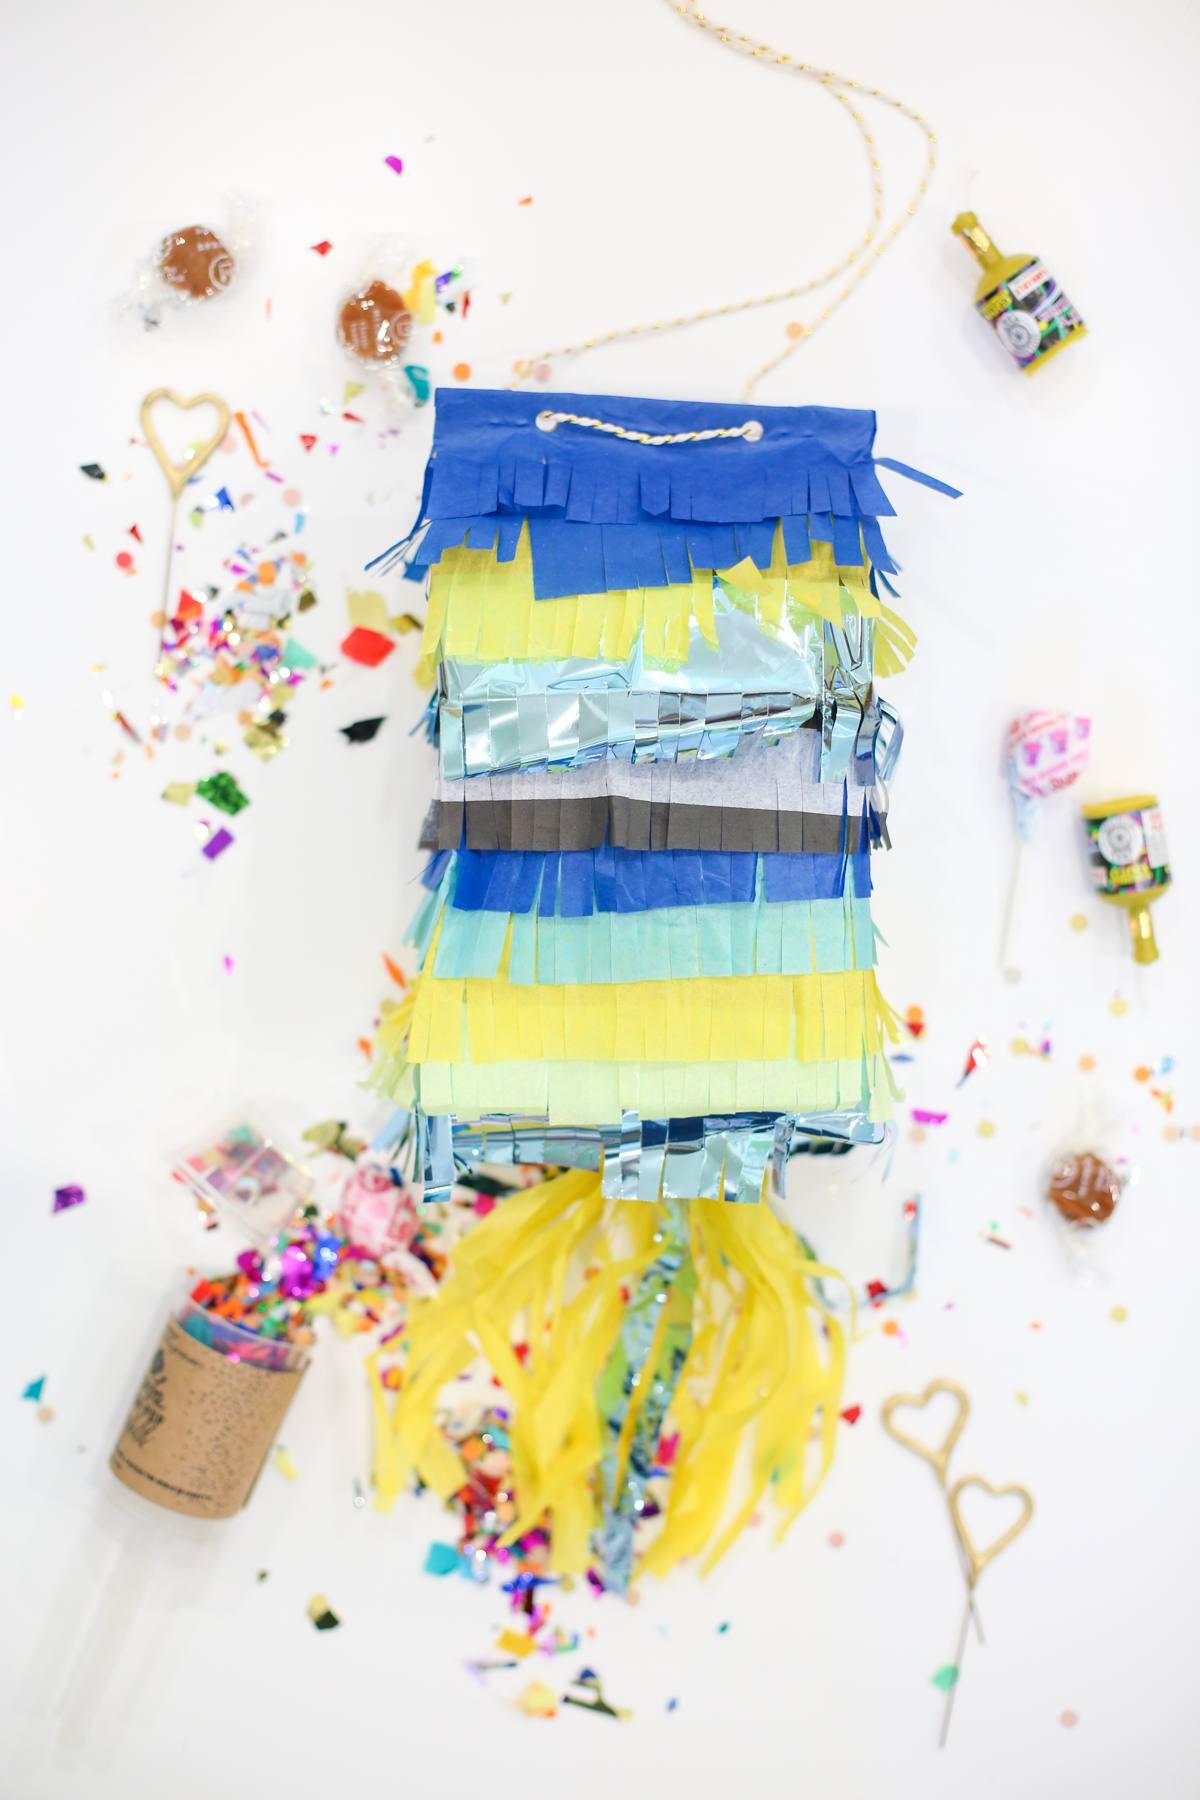 How to Make a Paper Bag Pinata